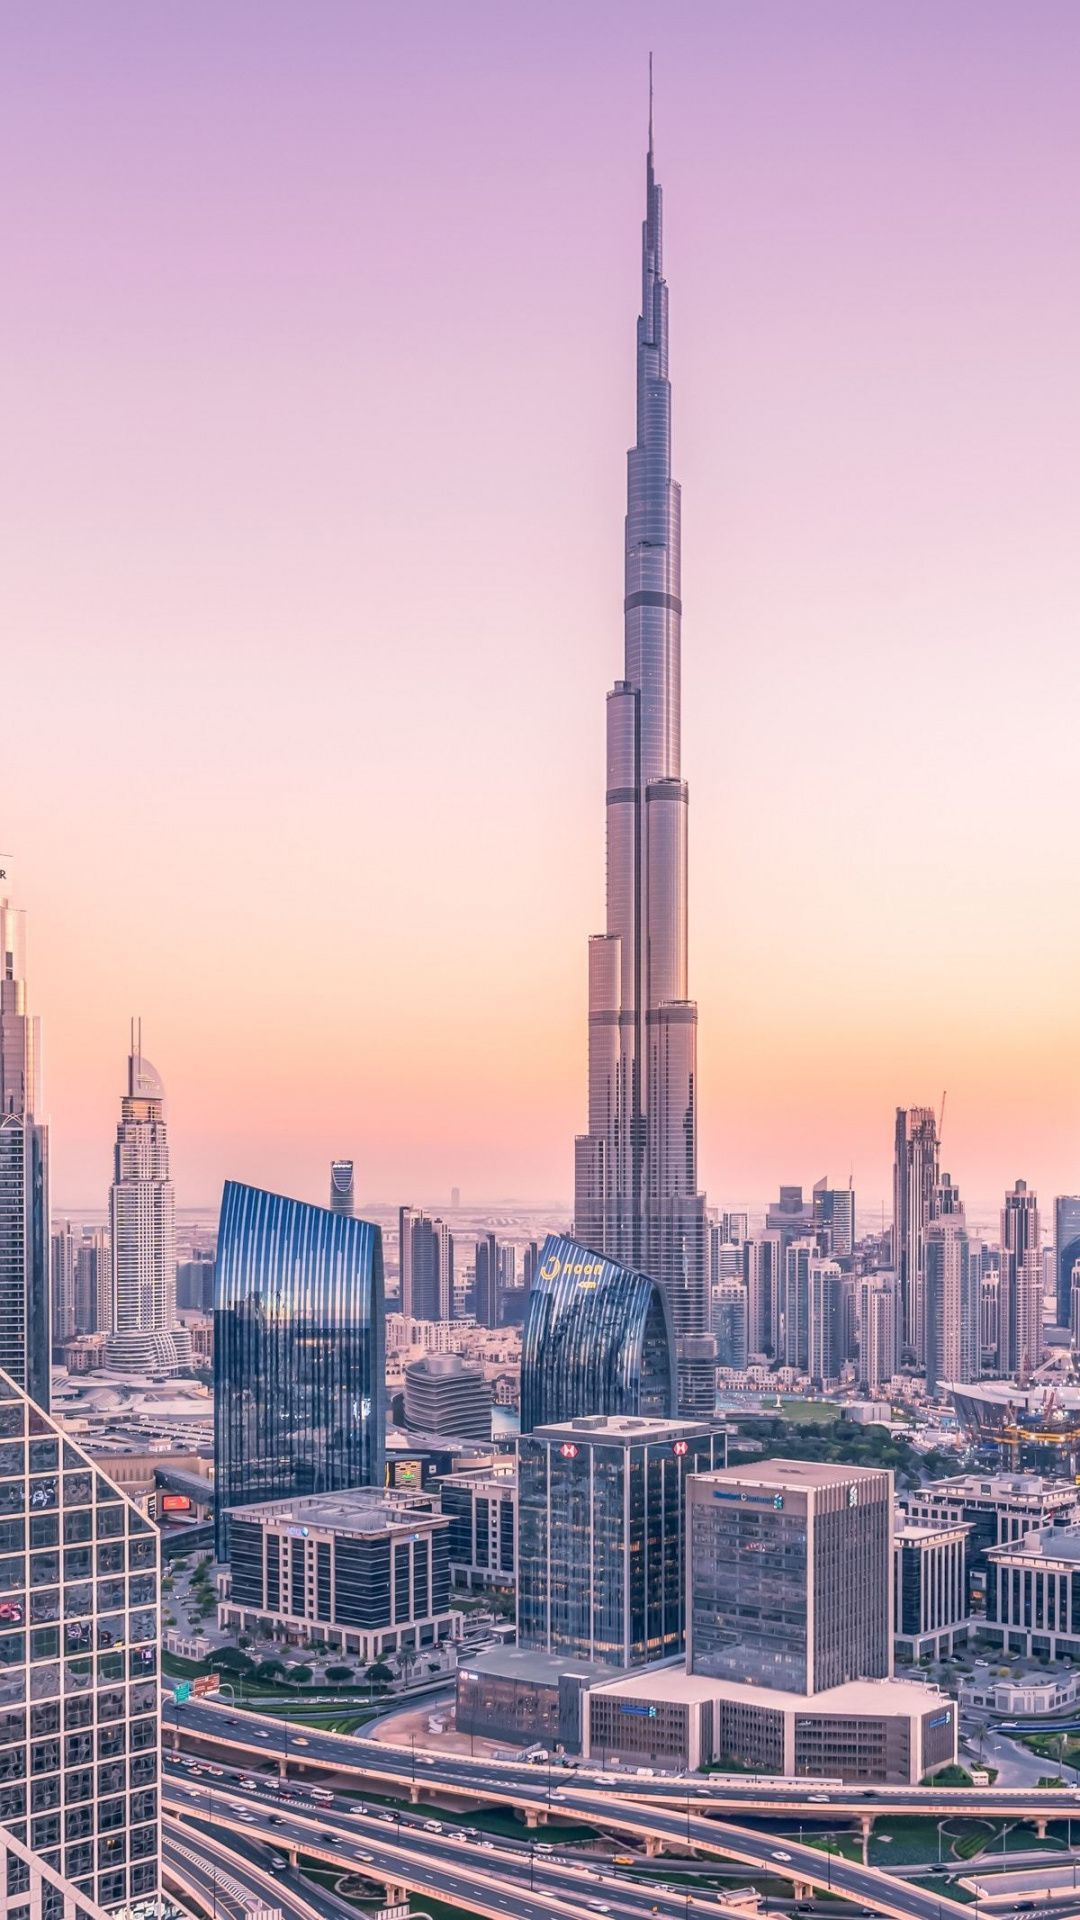 1080x1920 Dubai Urban Town Buildings Cityscape Wallpaper